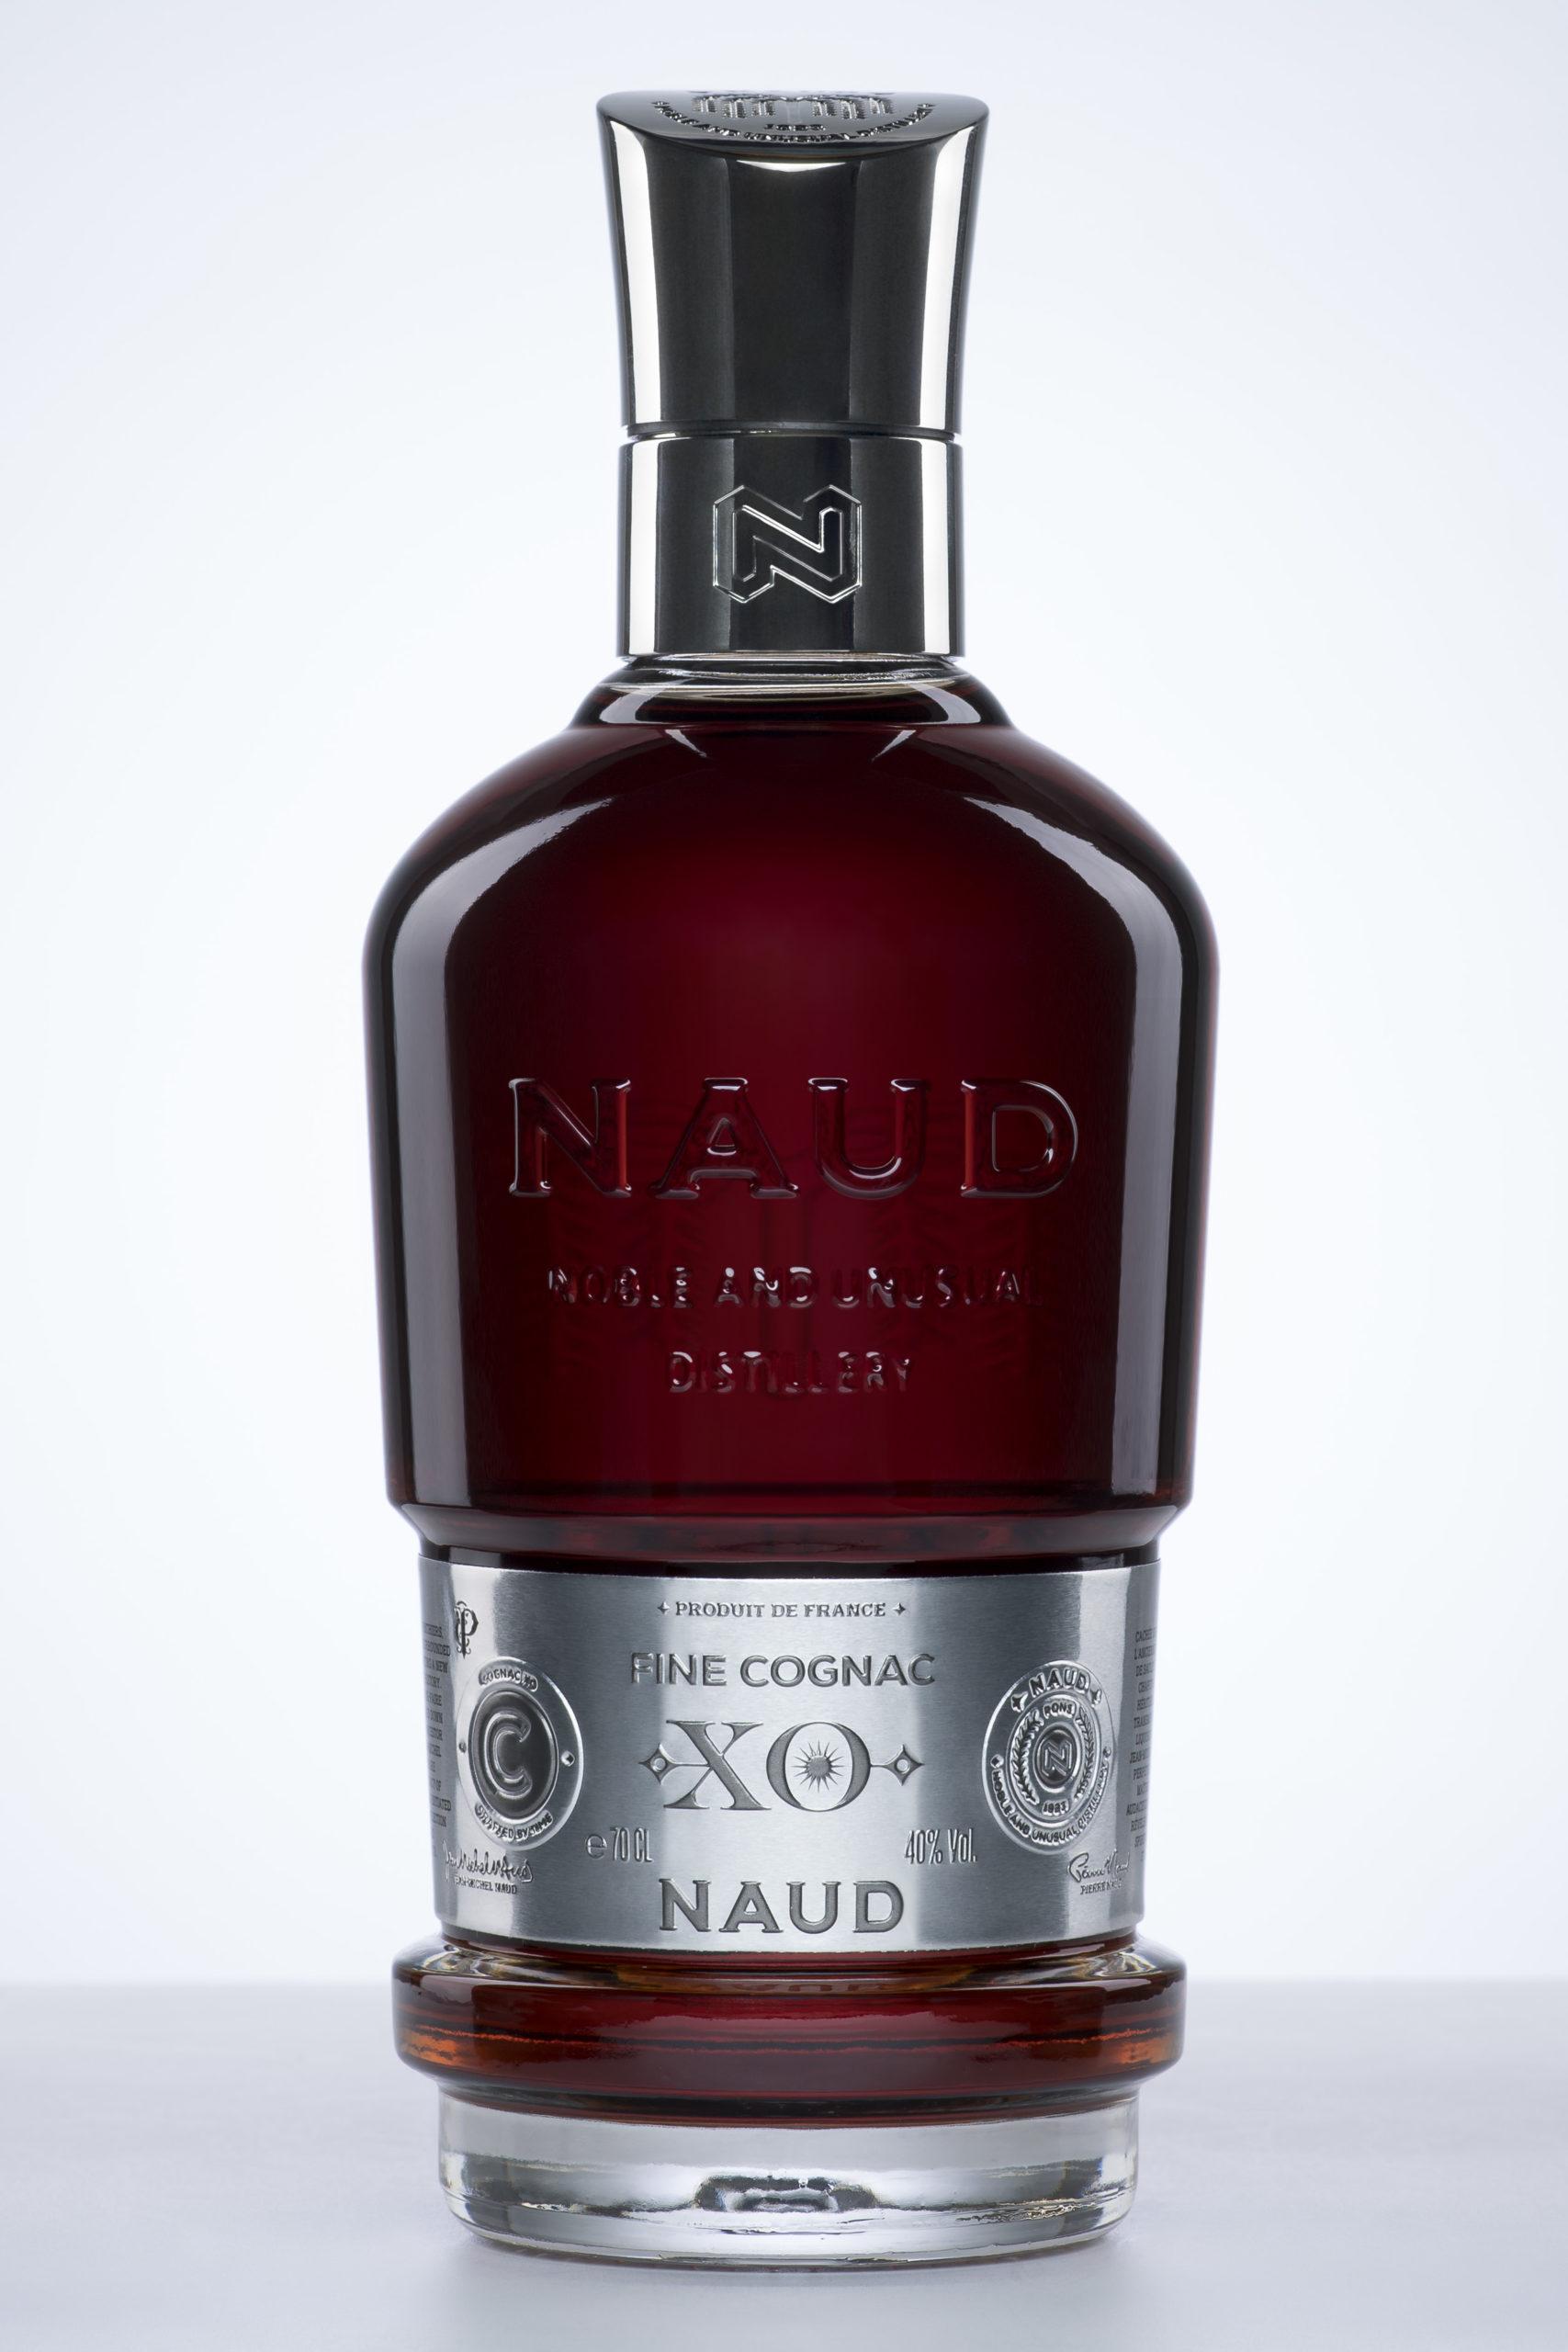 NAUD_Bouteilles_SPIRITUEUX_Cognac-Rhum-Gin-Vodka-Identite-Marque-Graphisme-Etiquette_PLANET-DESIGN-PARIS-Eric-Berthes_04-scaled.jpg